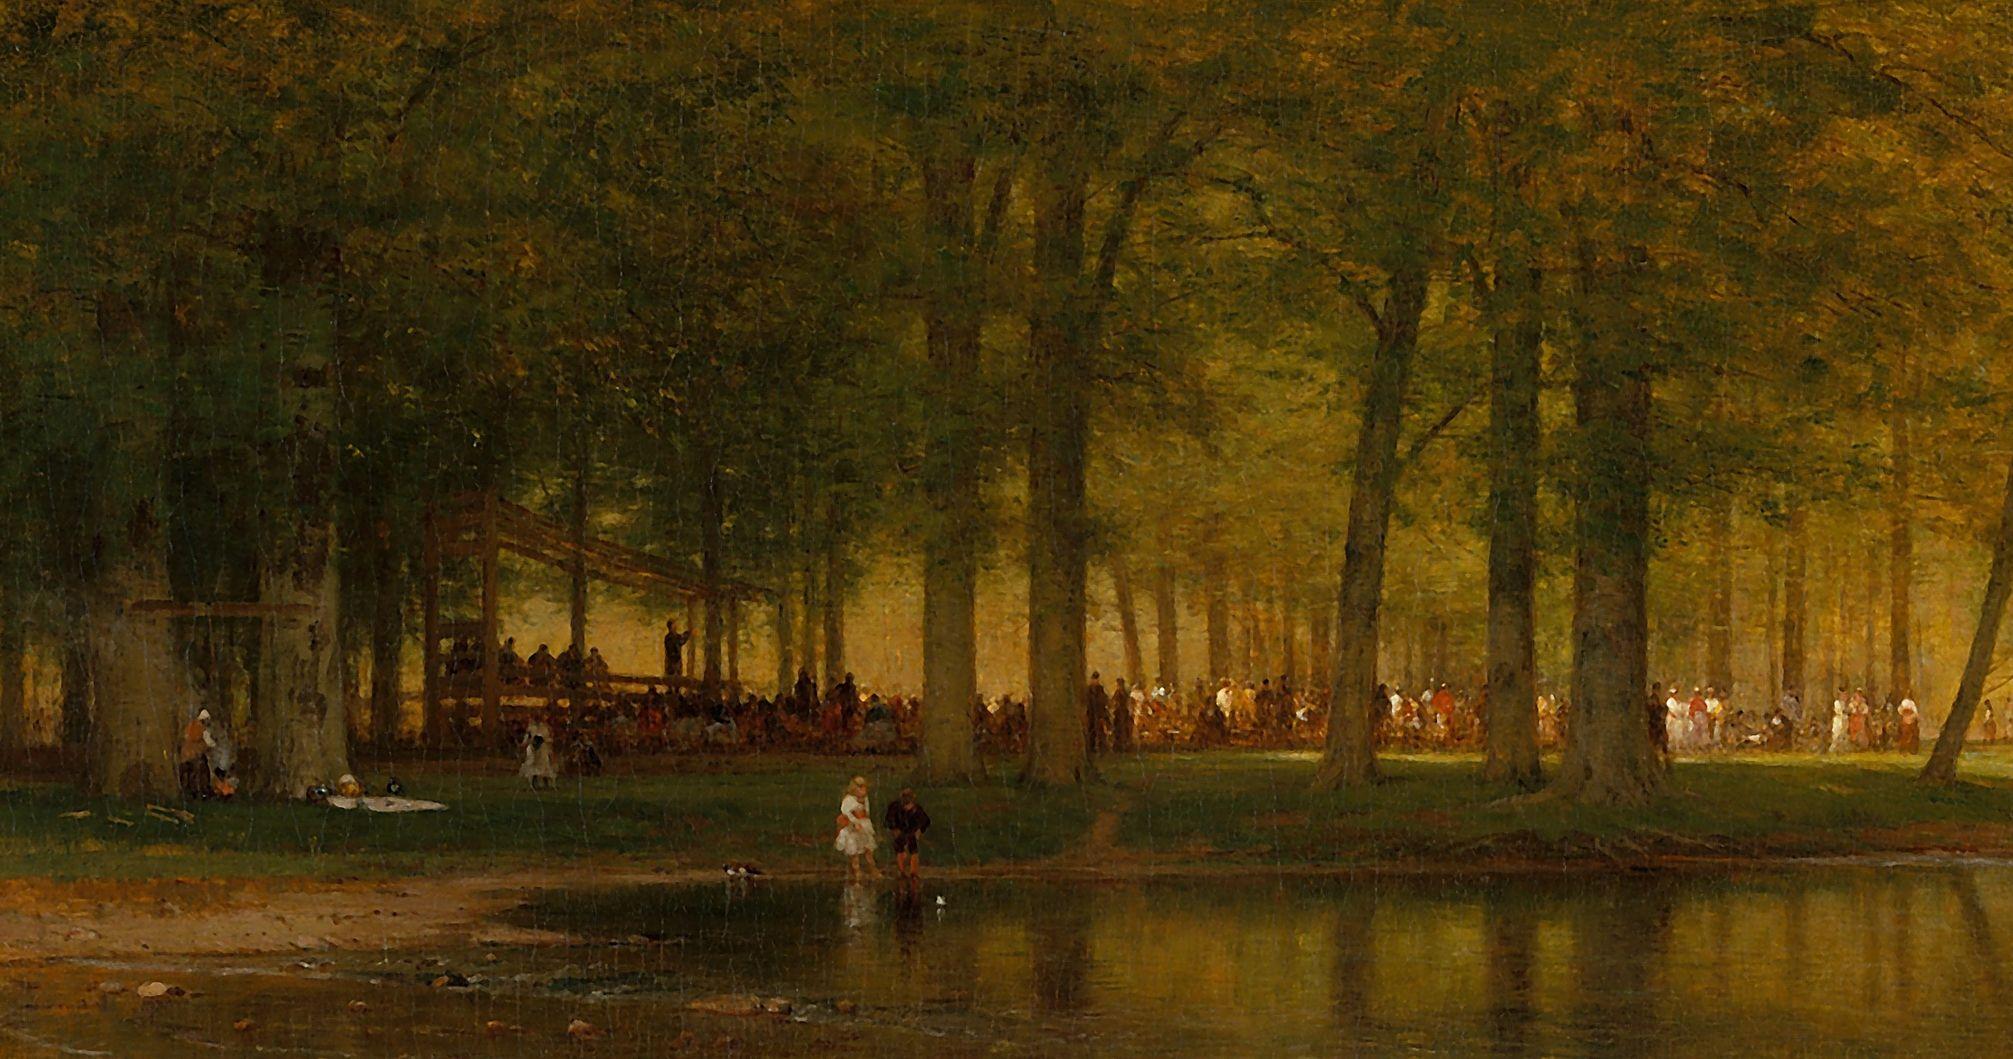 The Camp Meeting, by Worthington Whittredge. Image via Church of Jesus Christ.